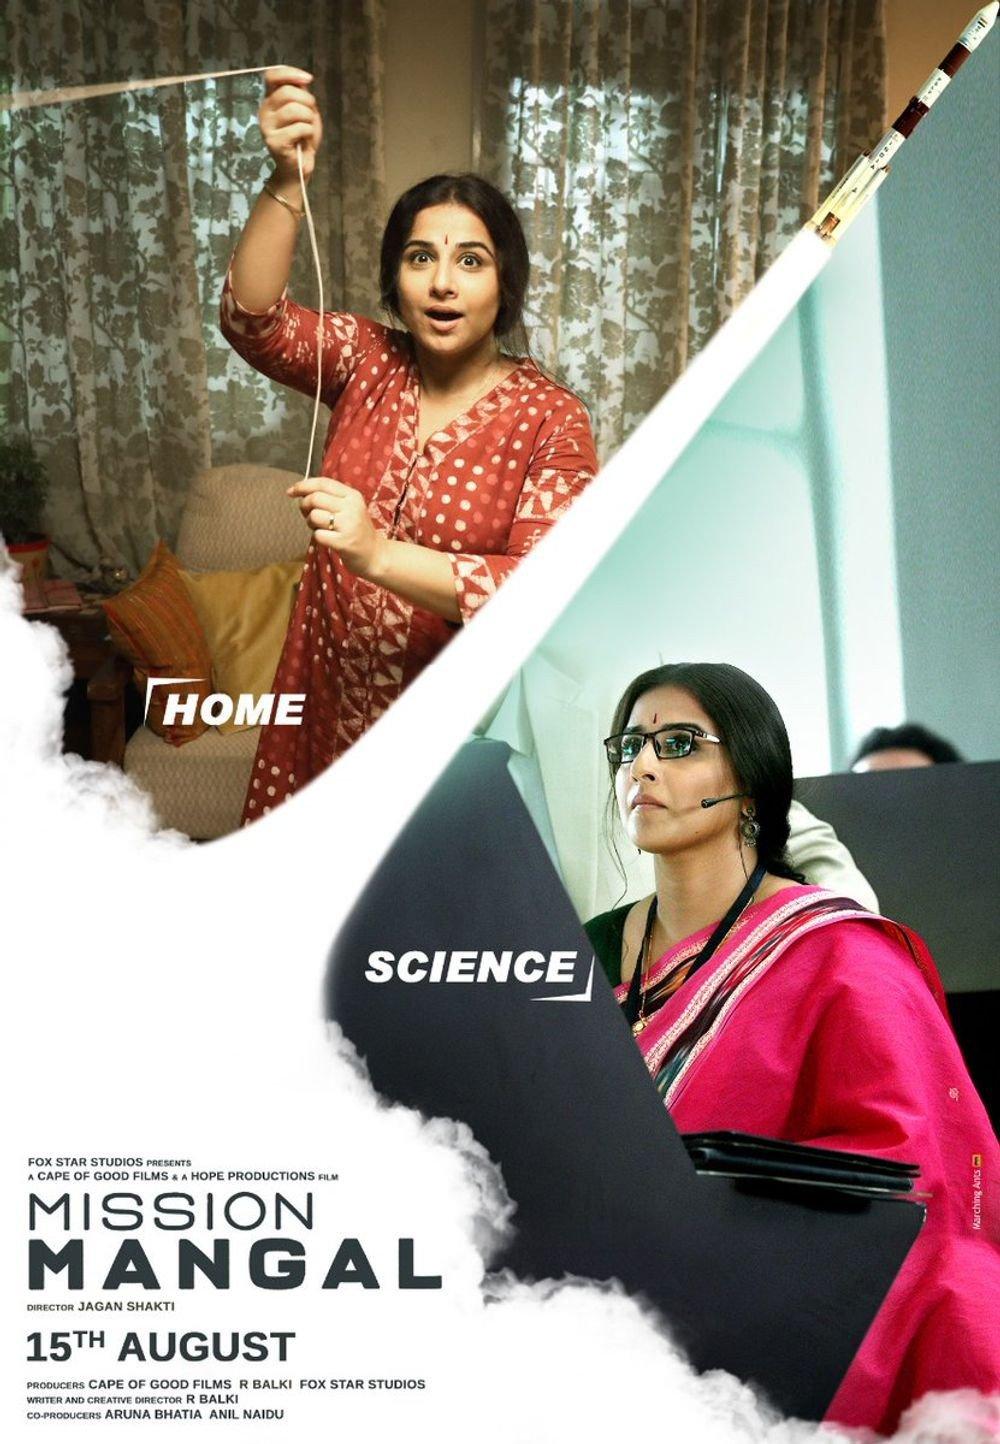 3-<p>Mission Mangal</p>